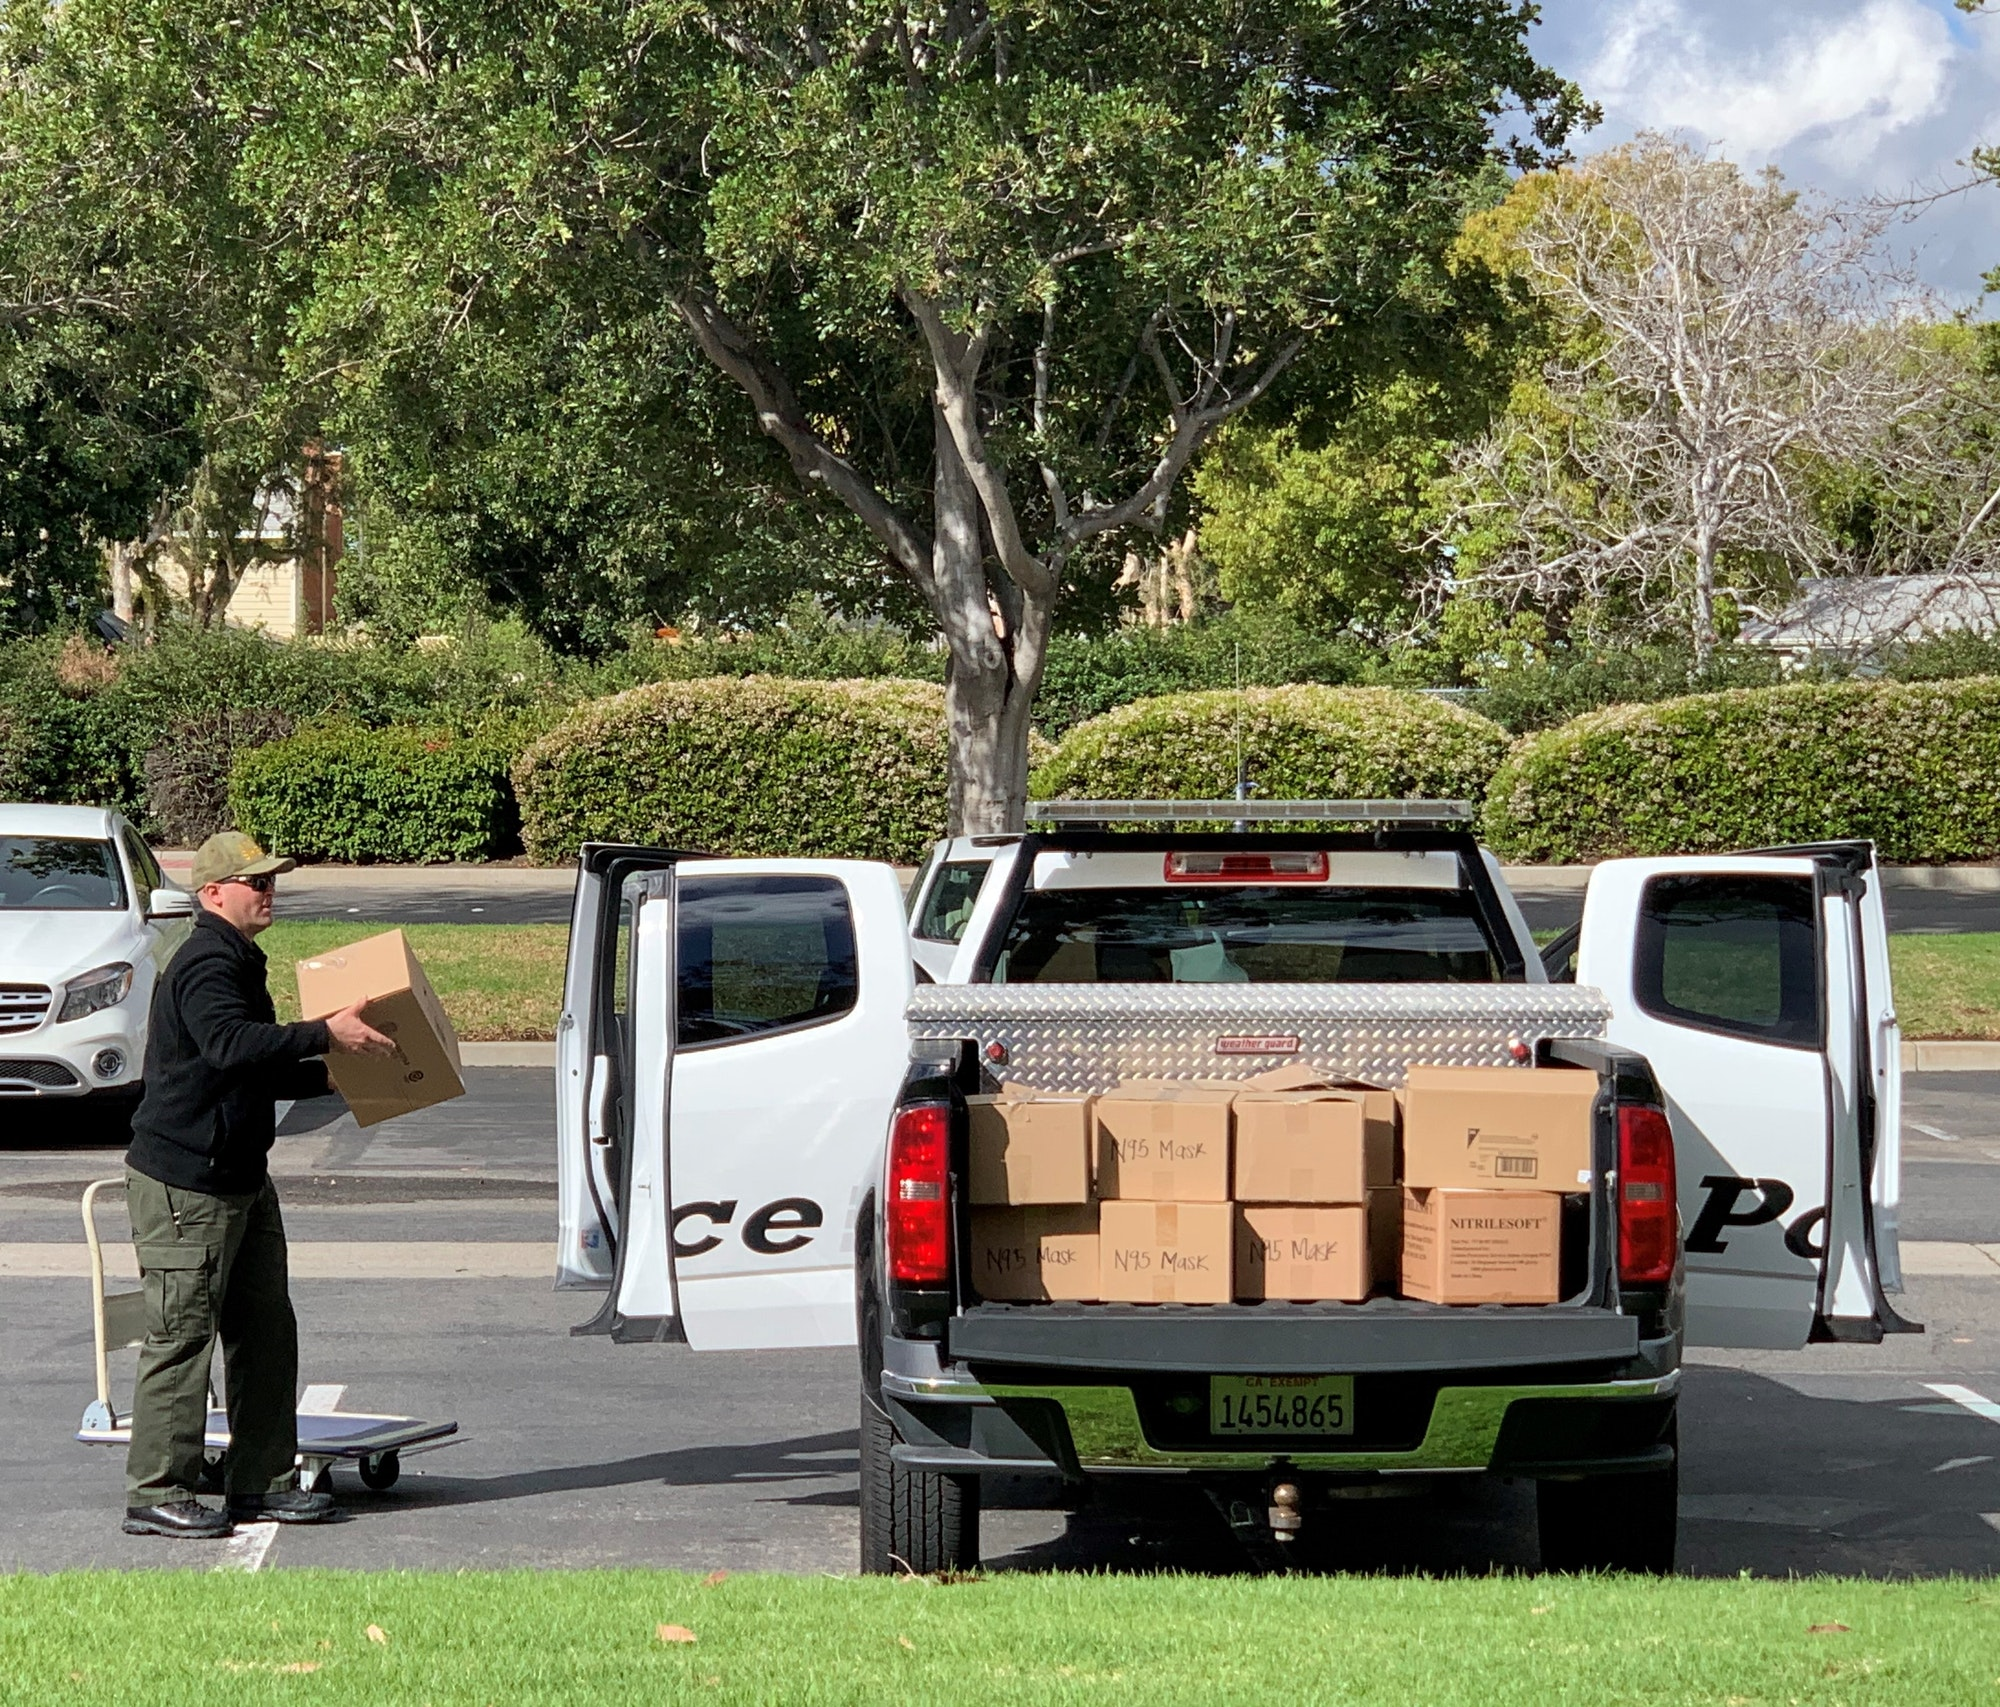 May contain: person, human, vehicle, van, and transportation